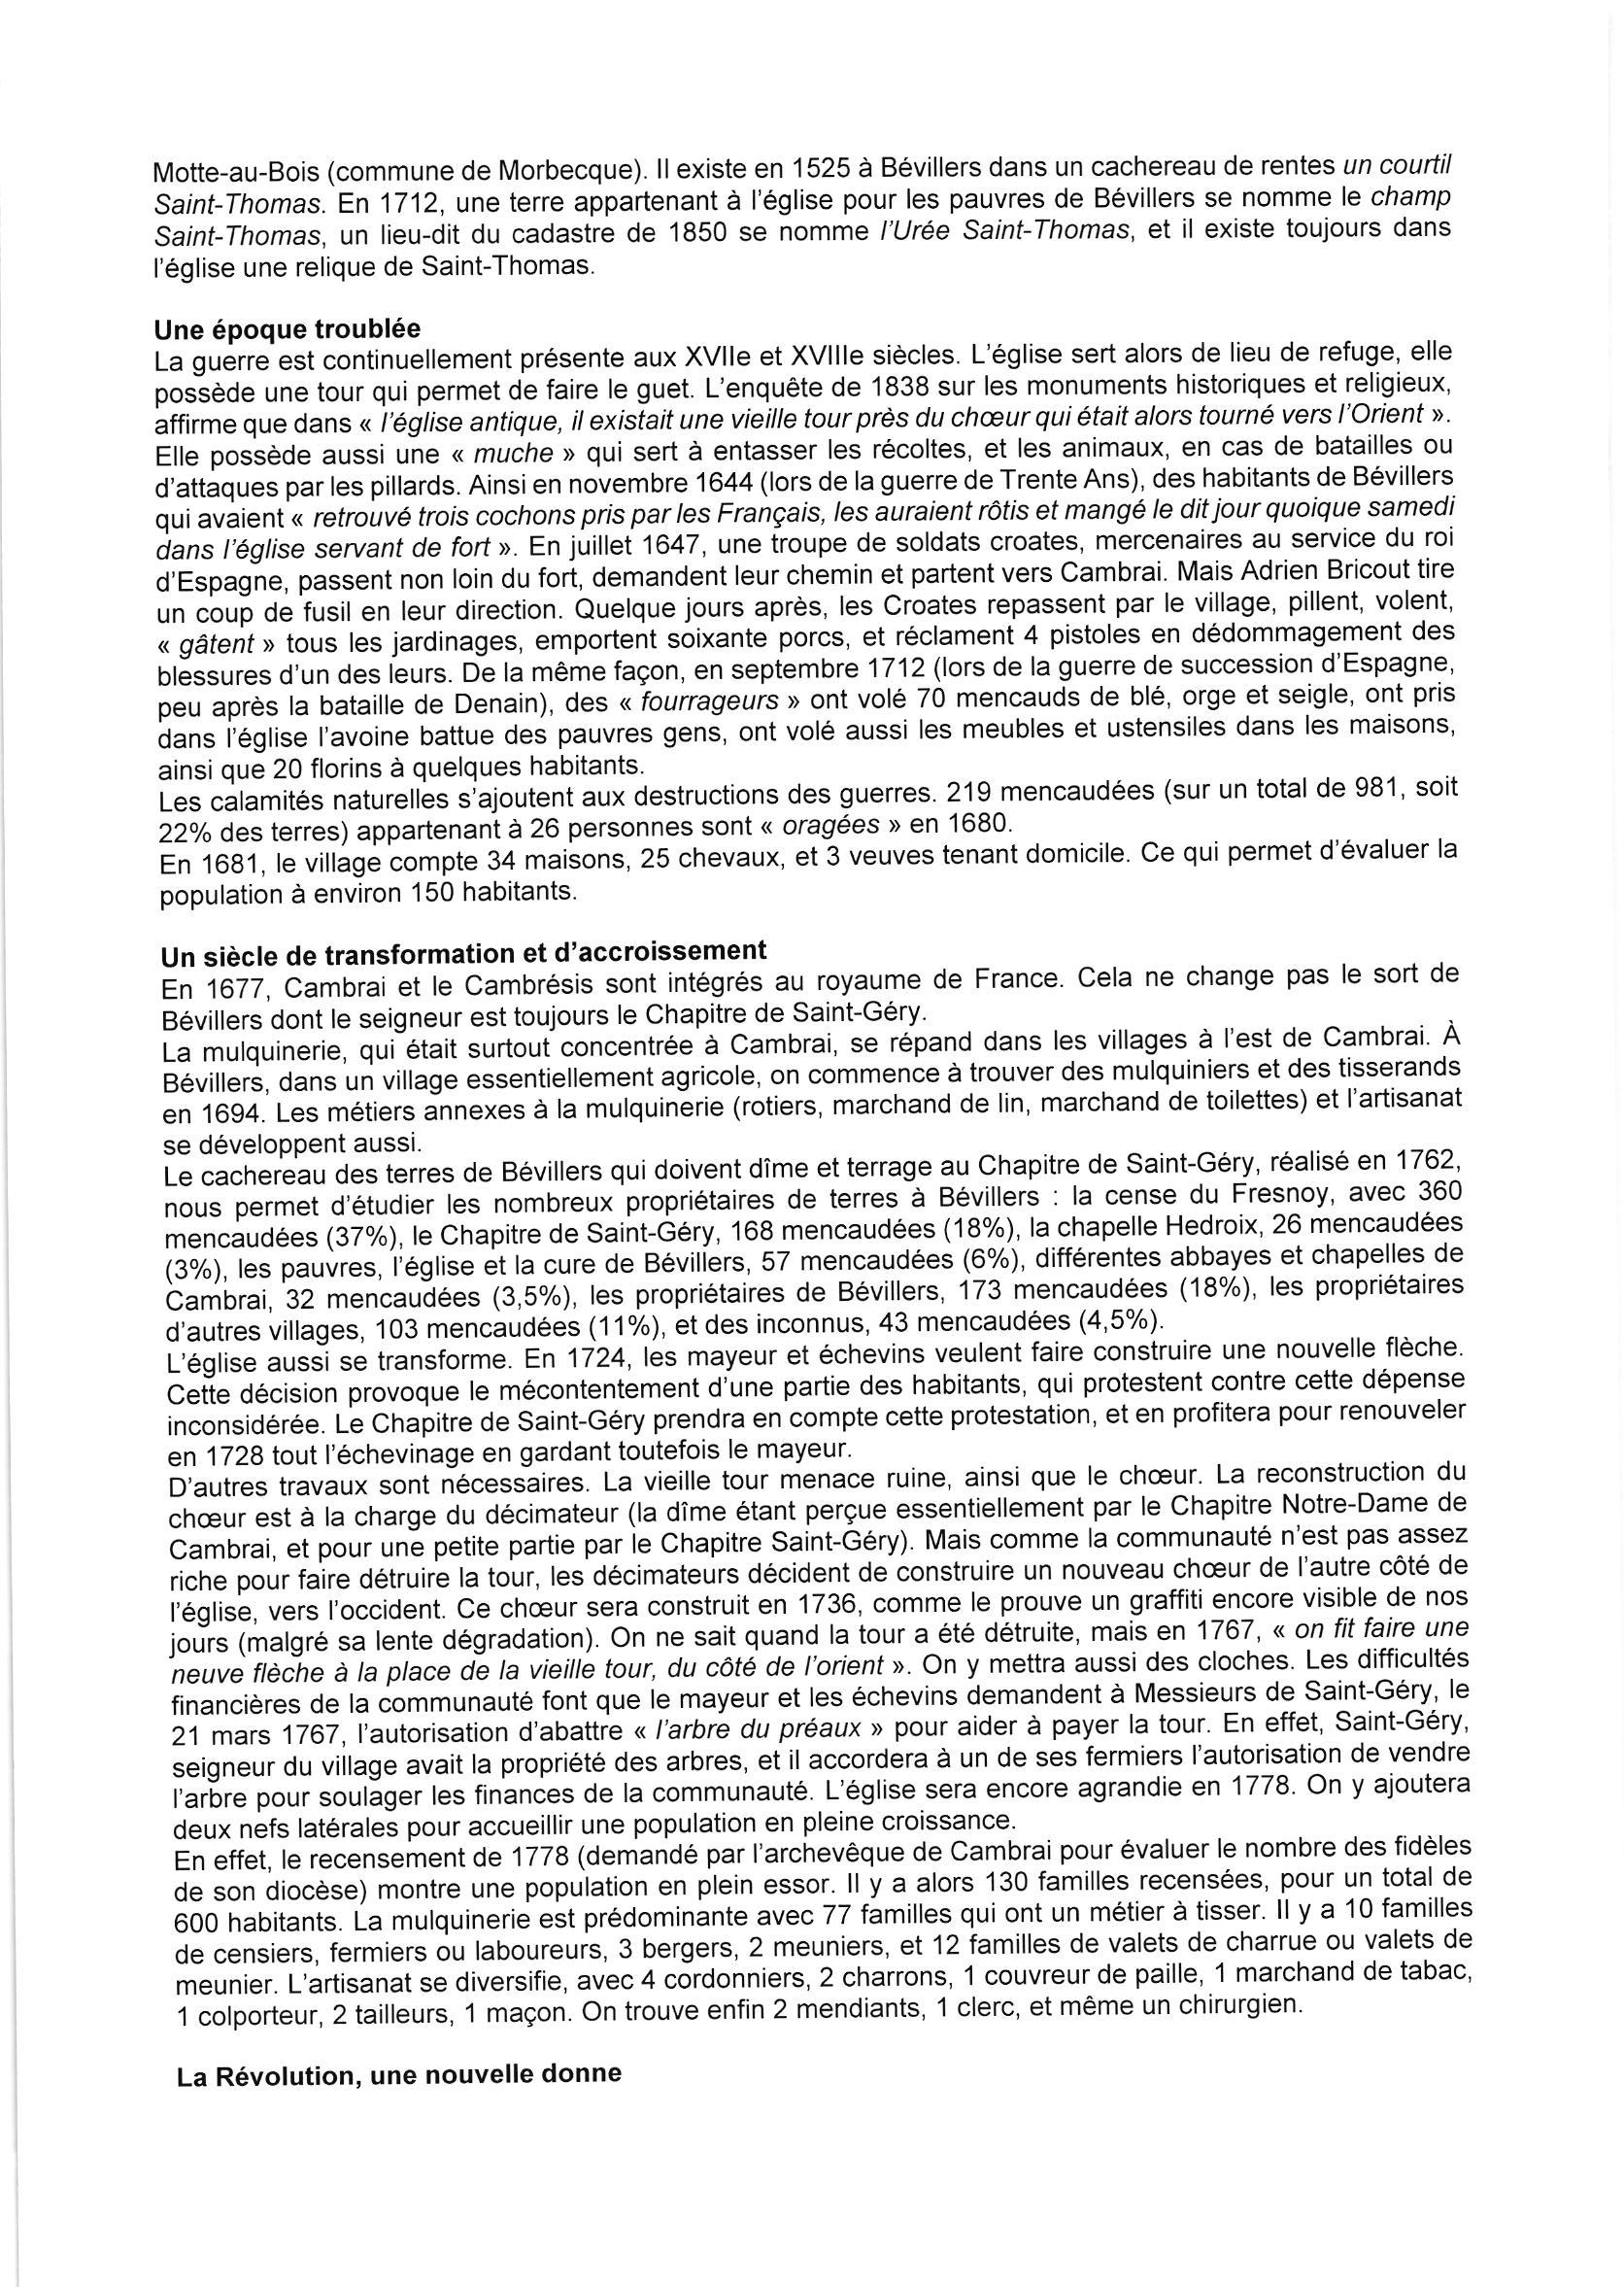 histoire-de-bevillers-2